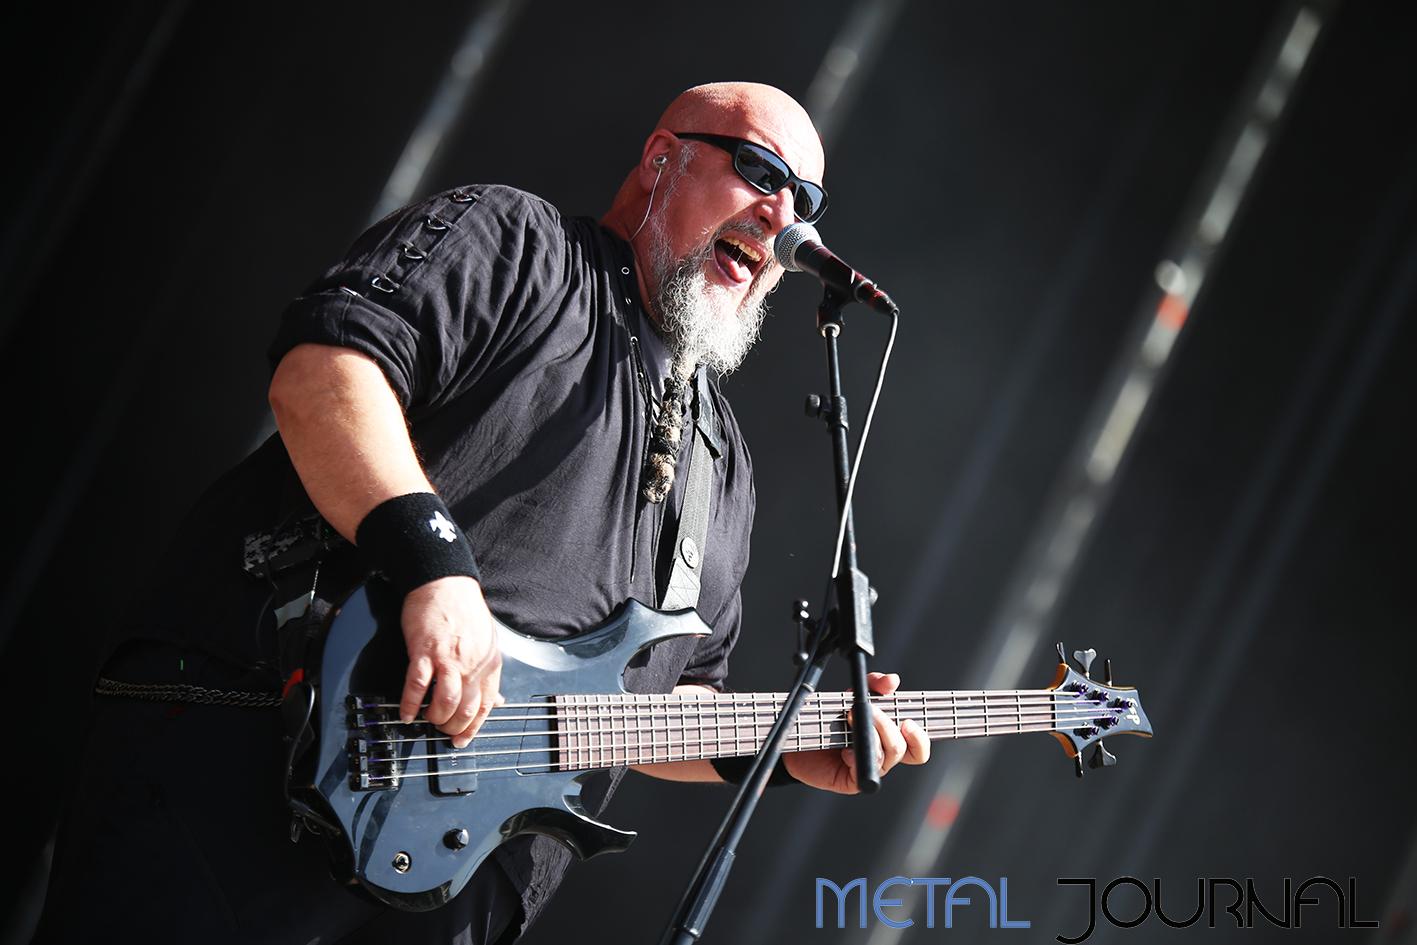 rage - metal journal rock fest barcelona 2019 pic 3